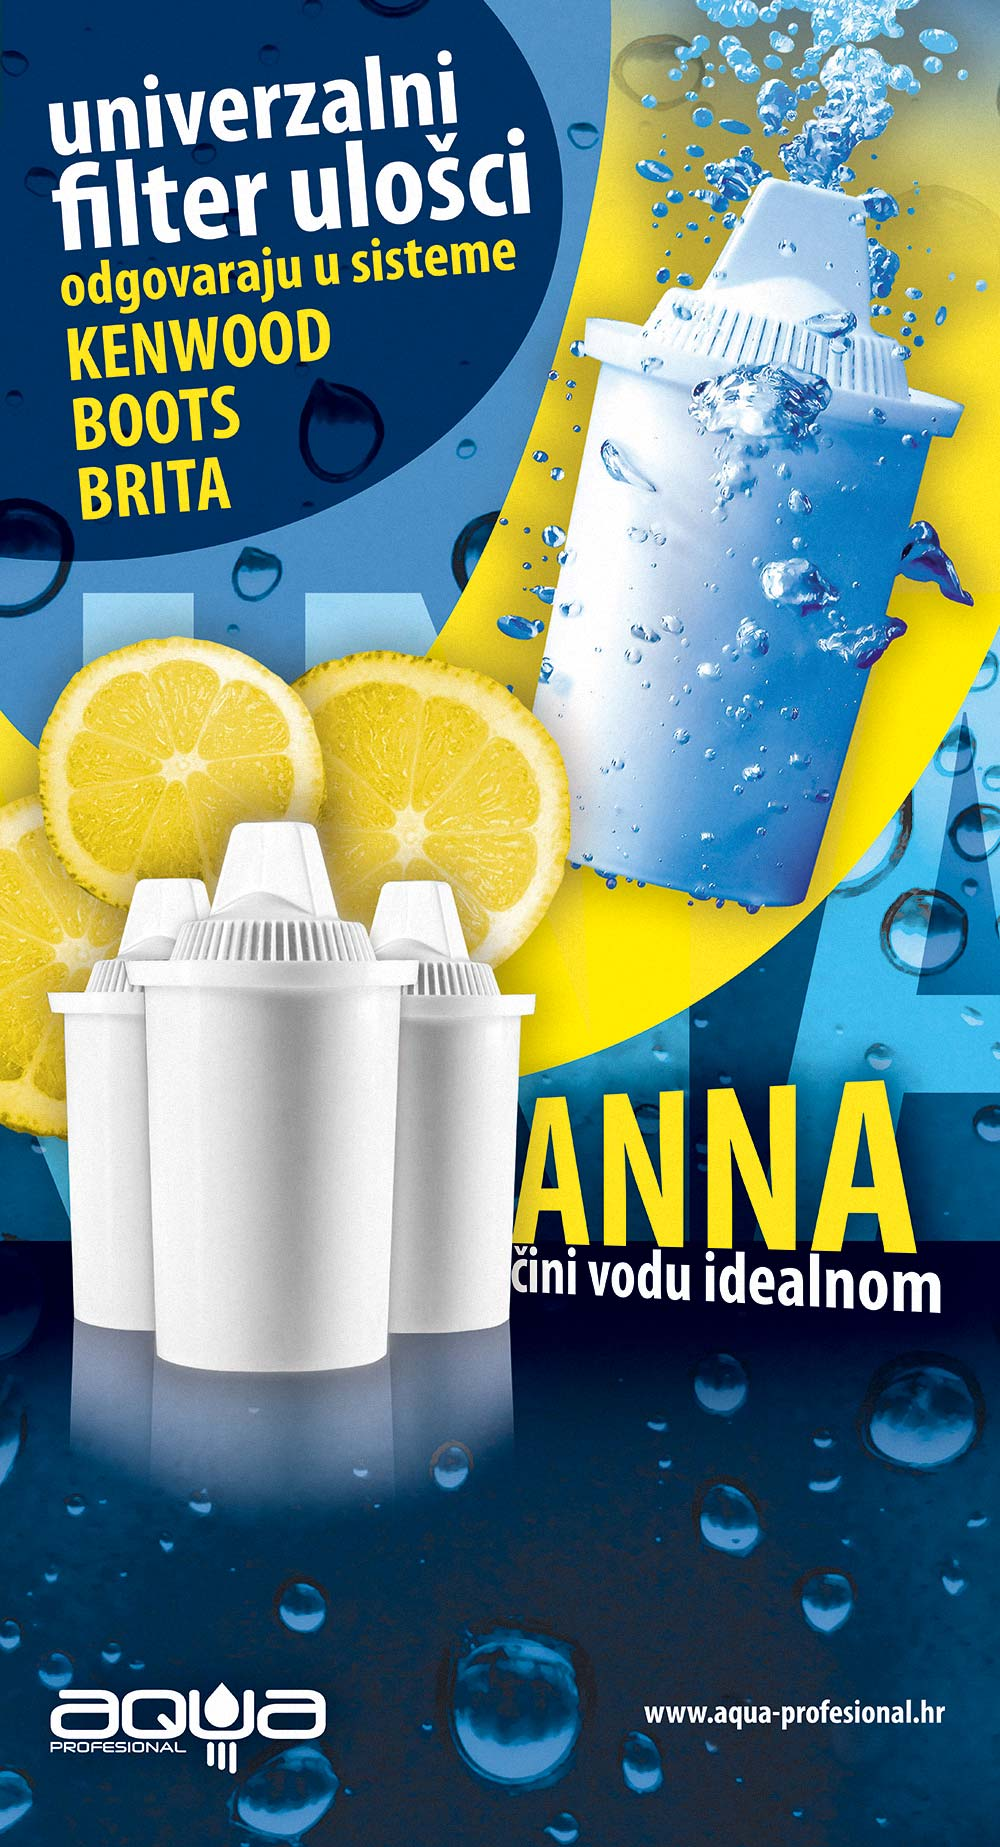 limbus-annaprint-2007_5